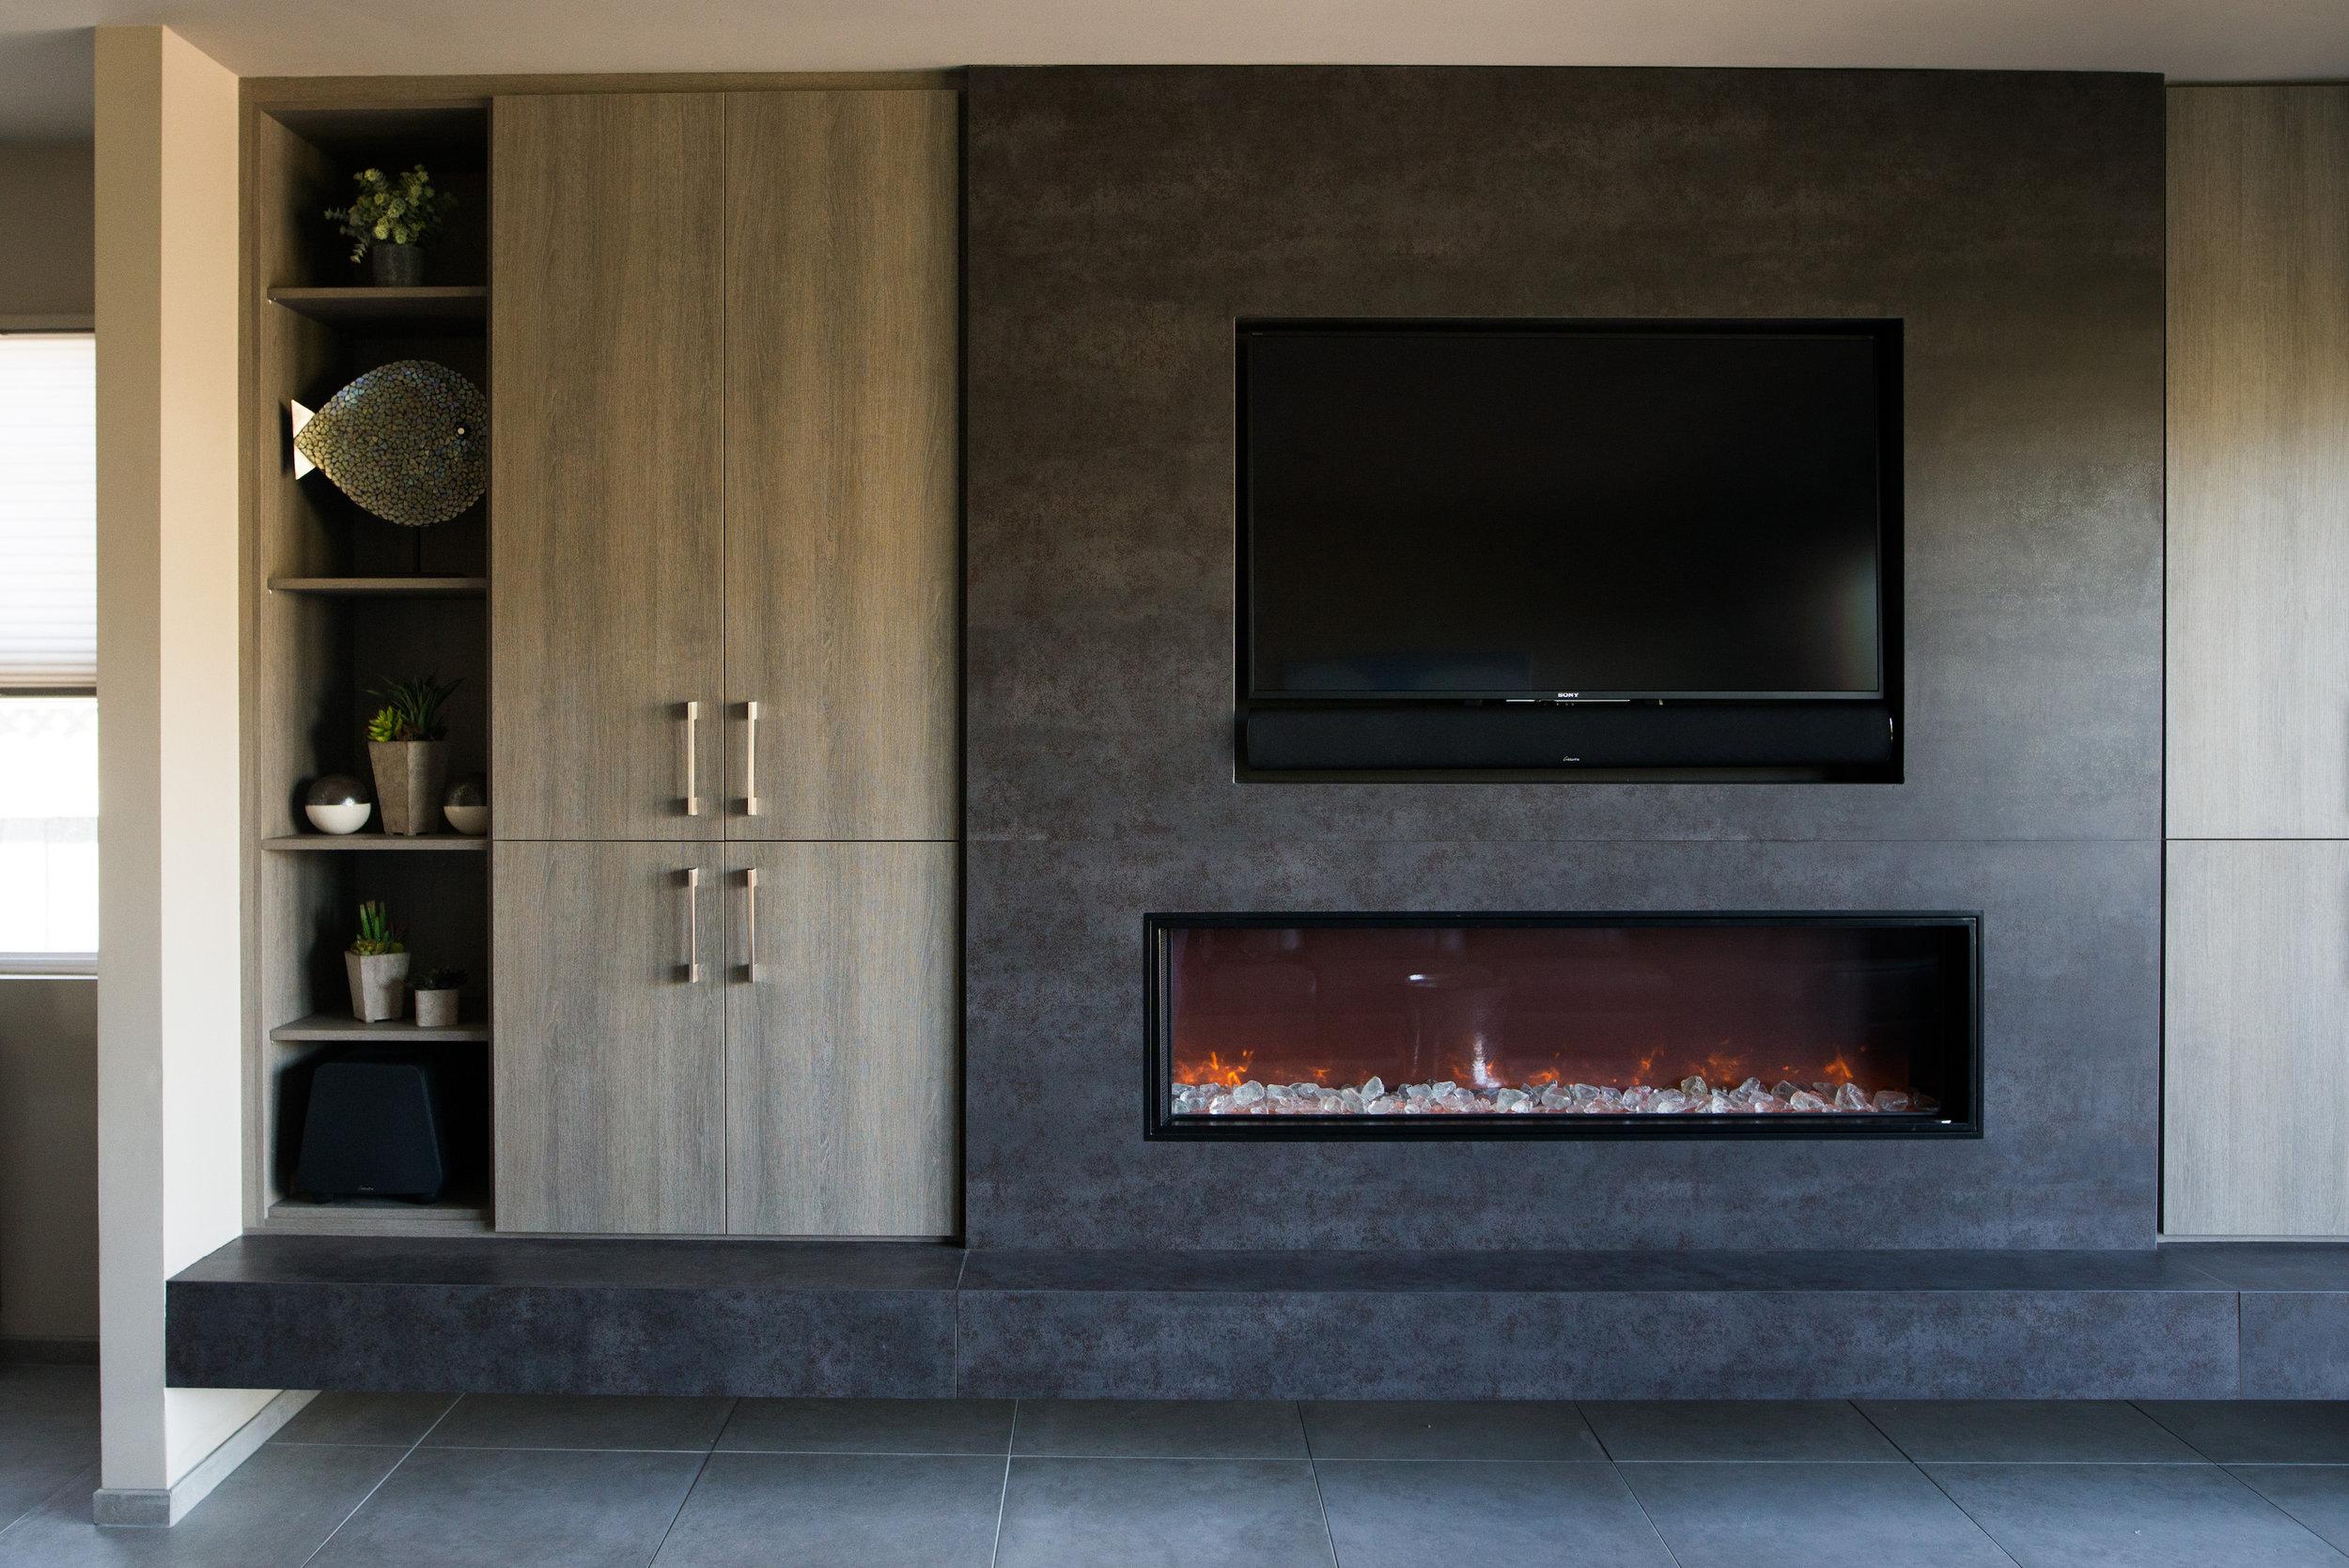 Fireplace Wall - Cody Design Studio